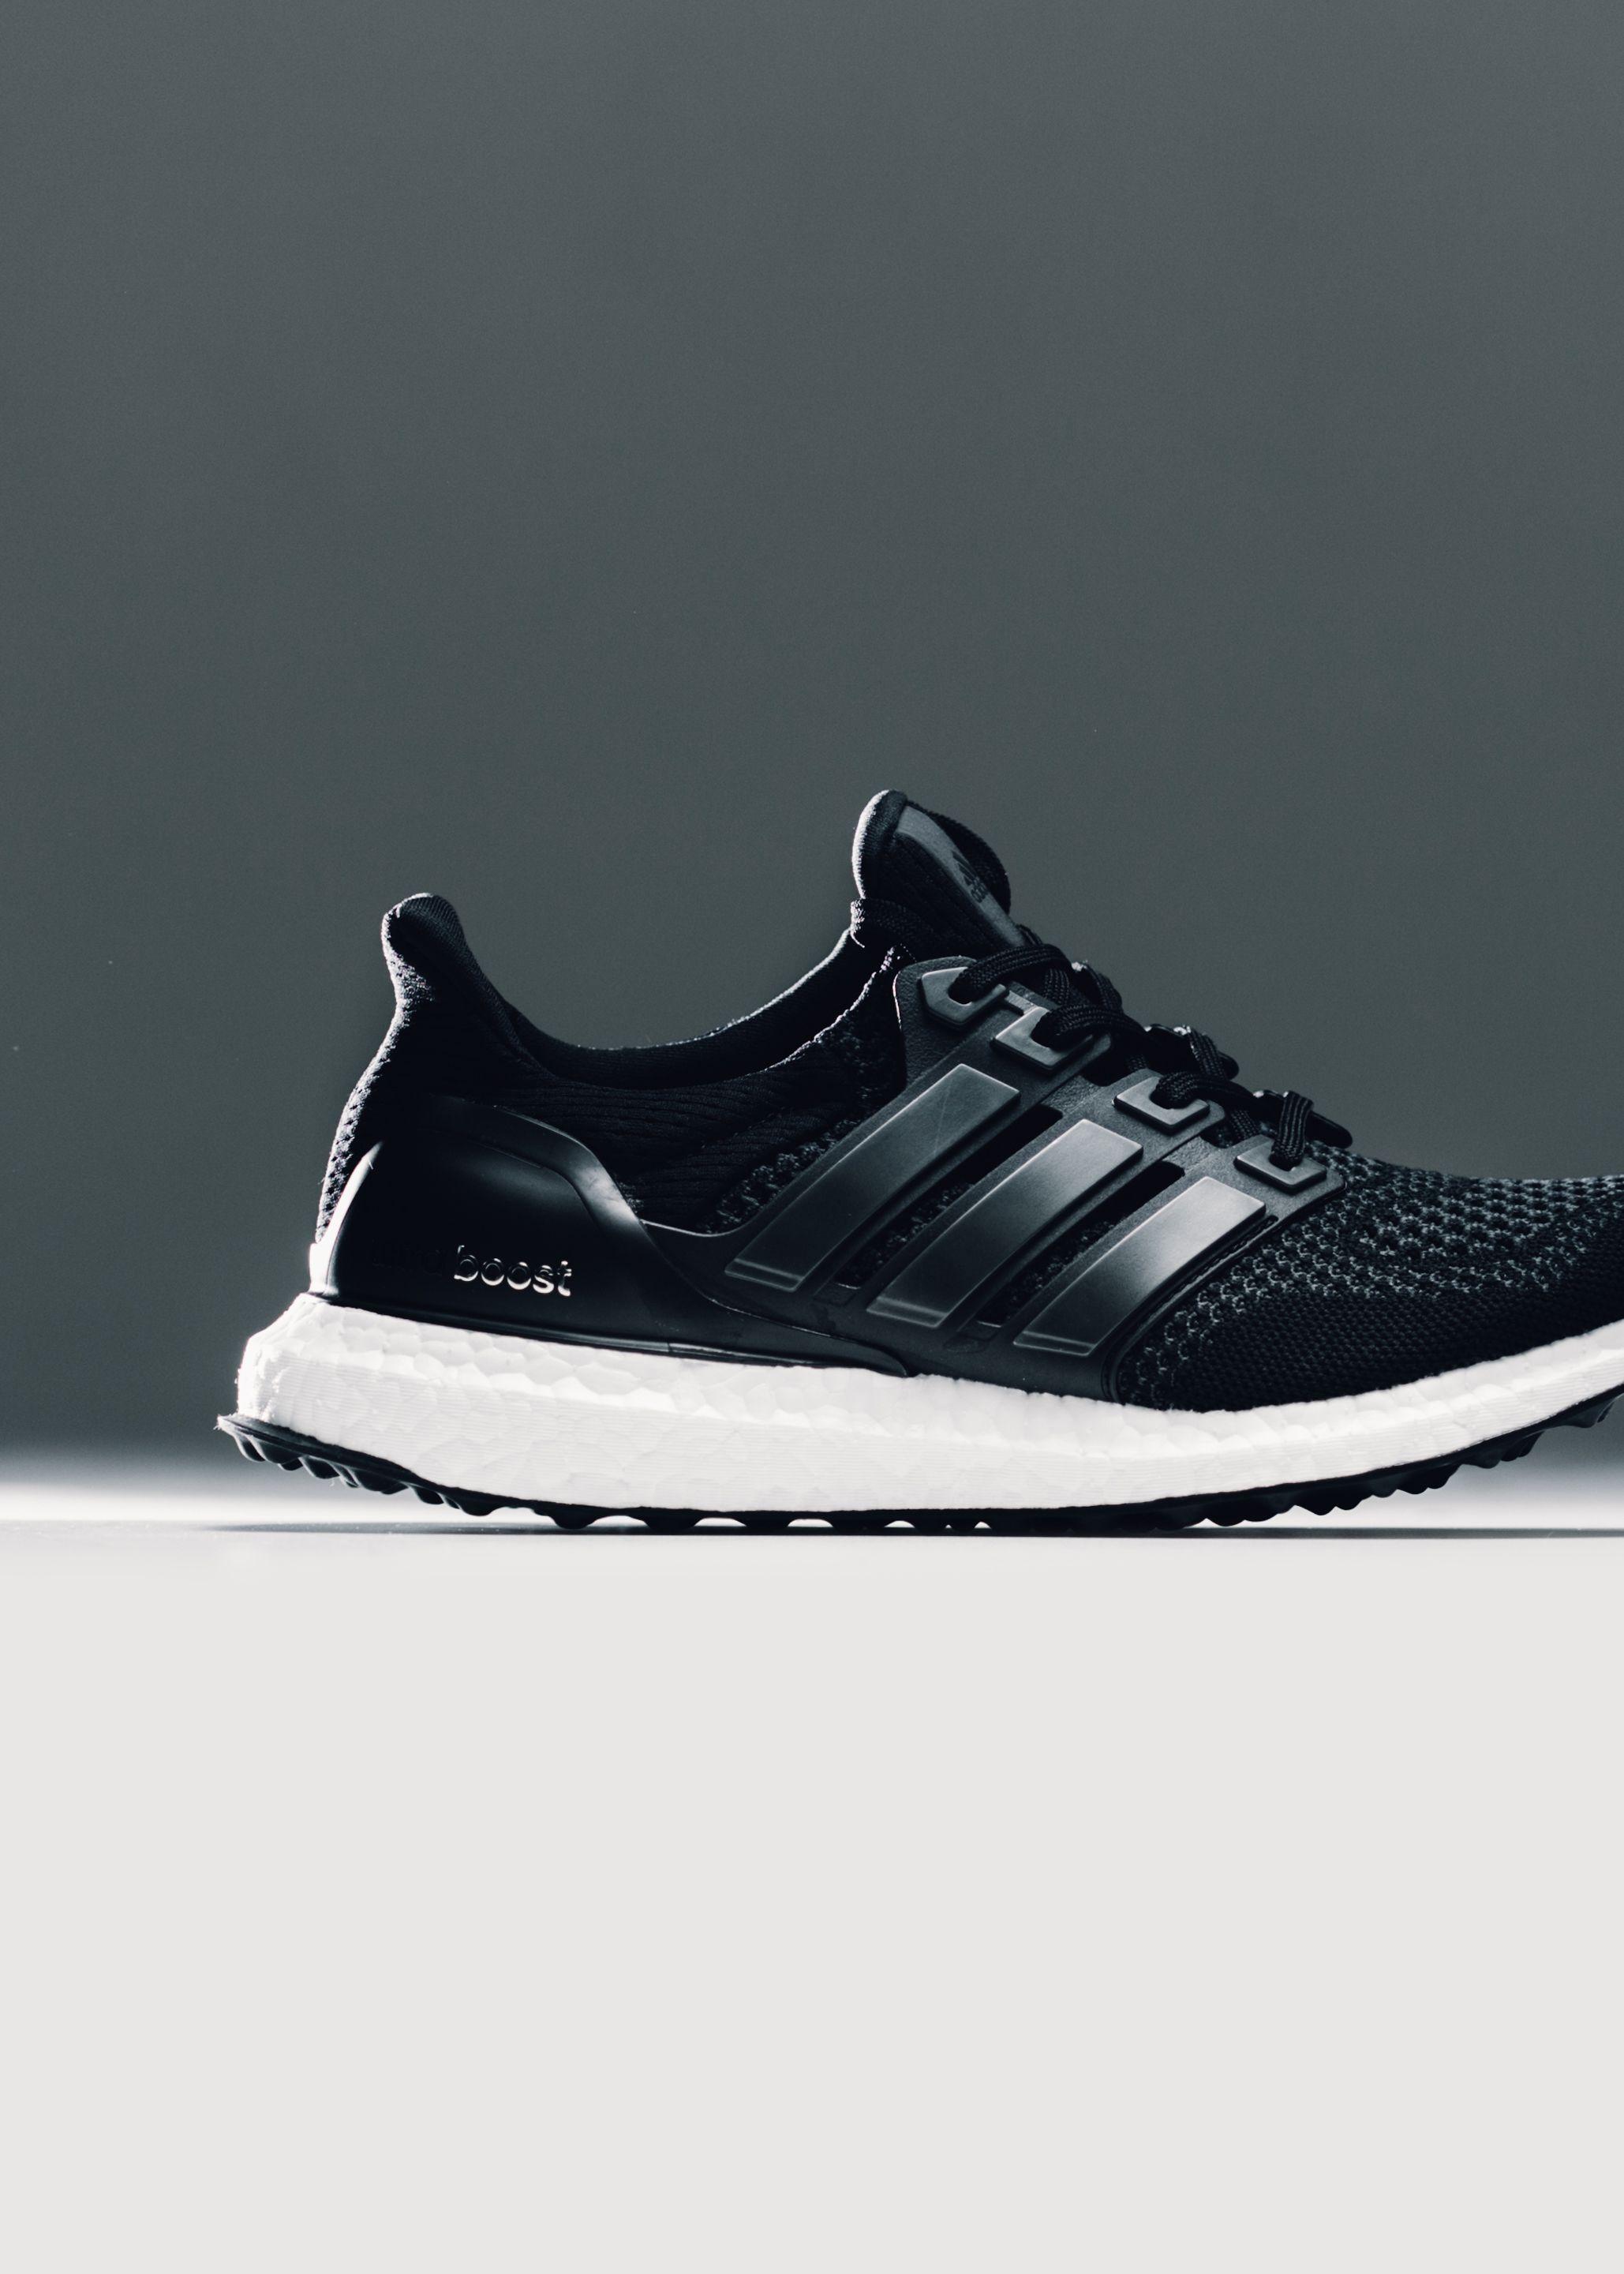 d1a6925cb50c9 Adidas Ultra Boost In Core Black  Adidas  AdidasOriginals  UltraBoost   Fashion  Streetwear  Style  Urban  Lookbook  Photography  Footwear  Sneakers   Kicks   ...